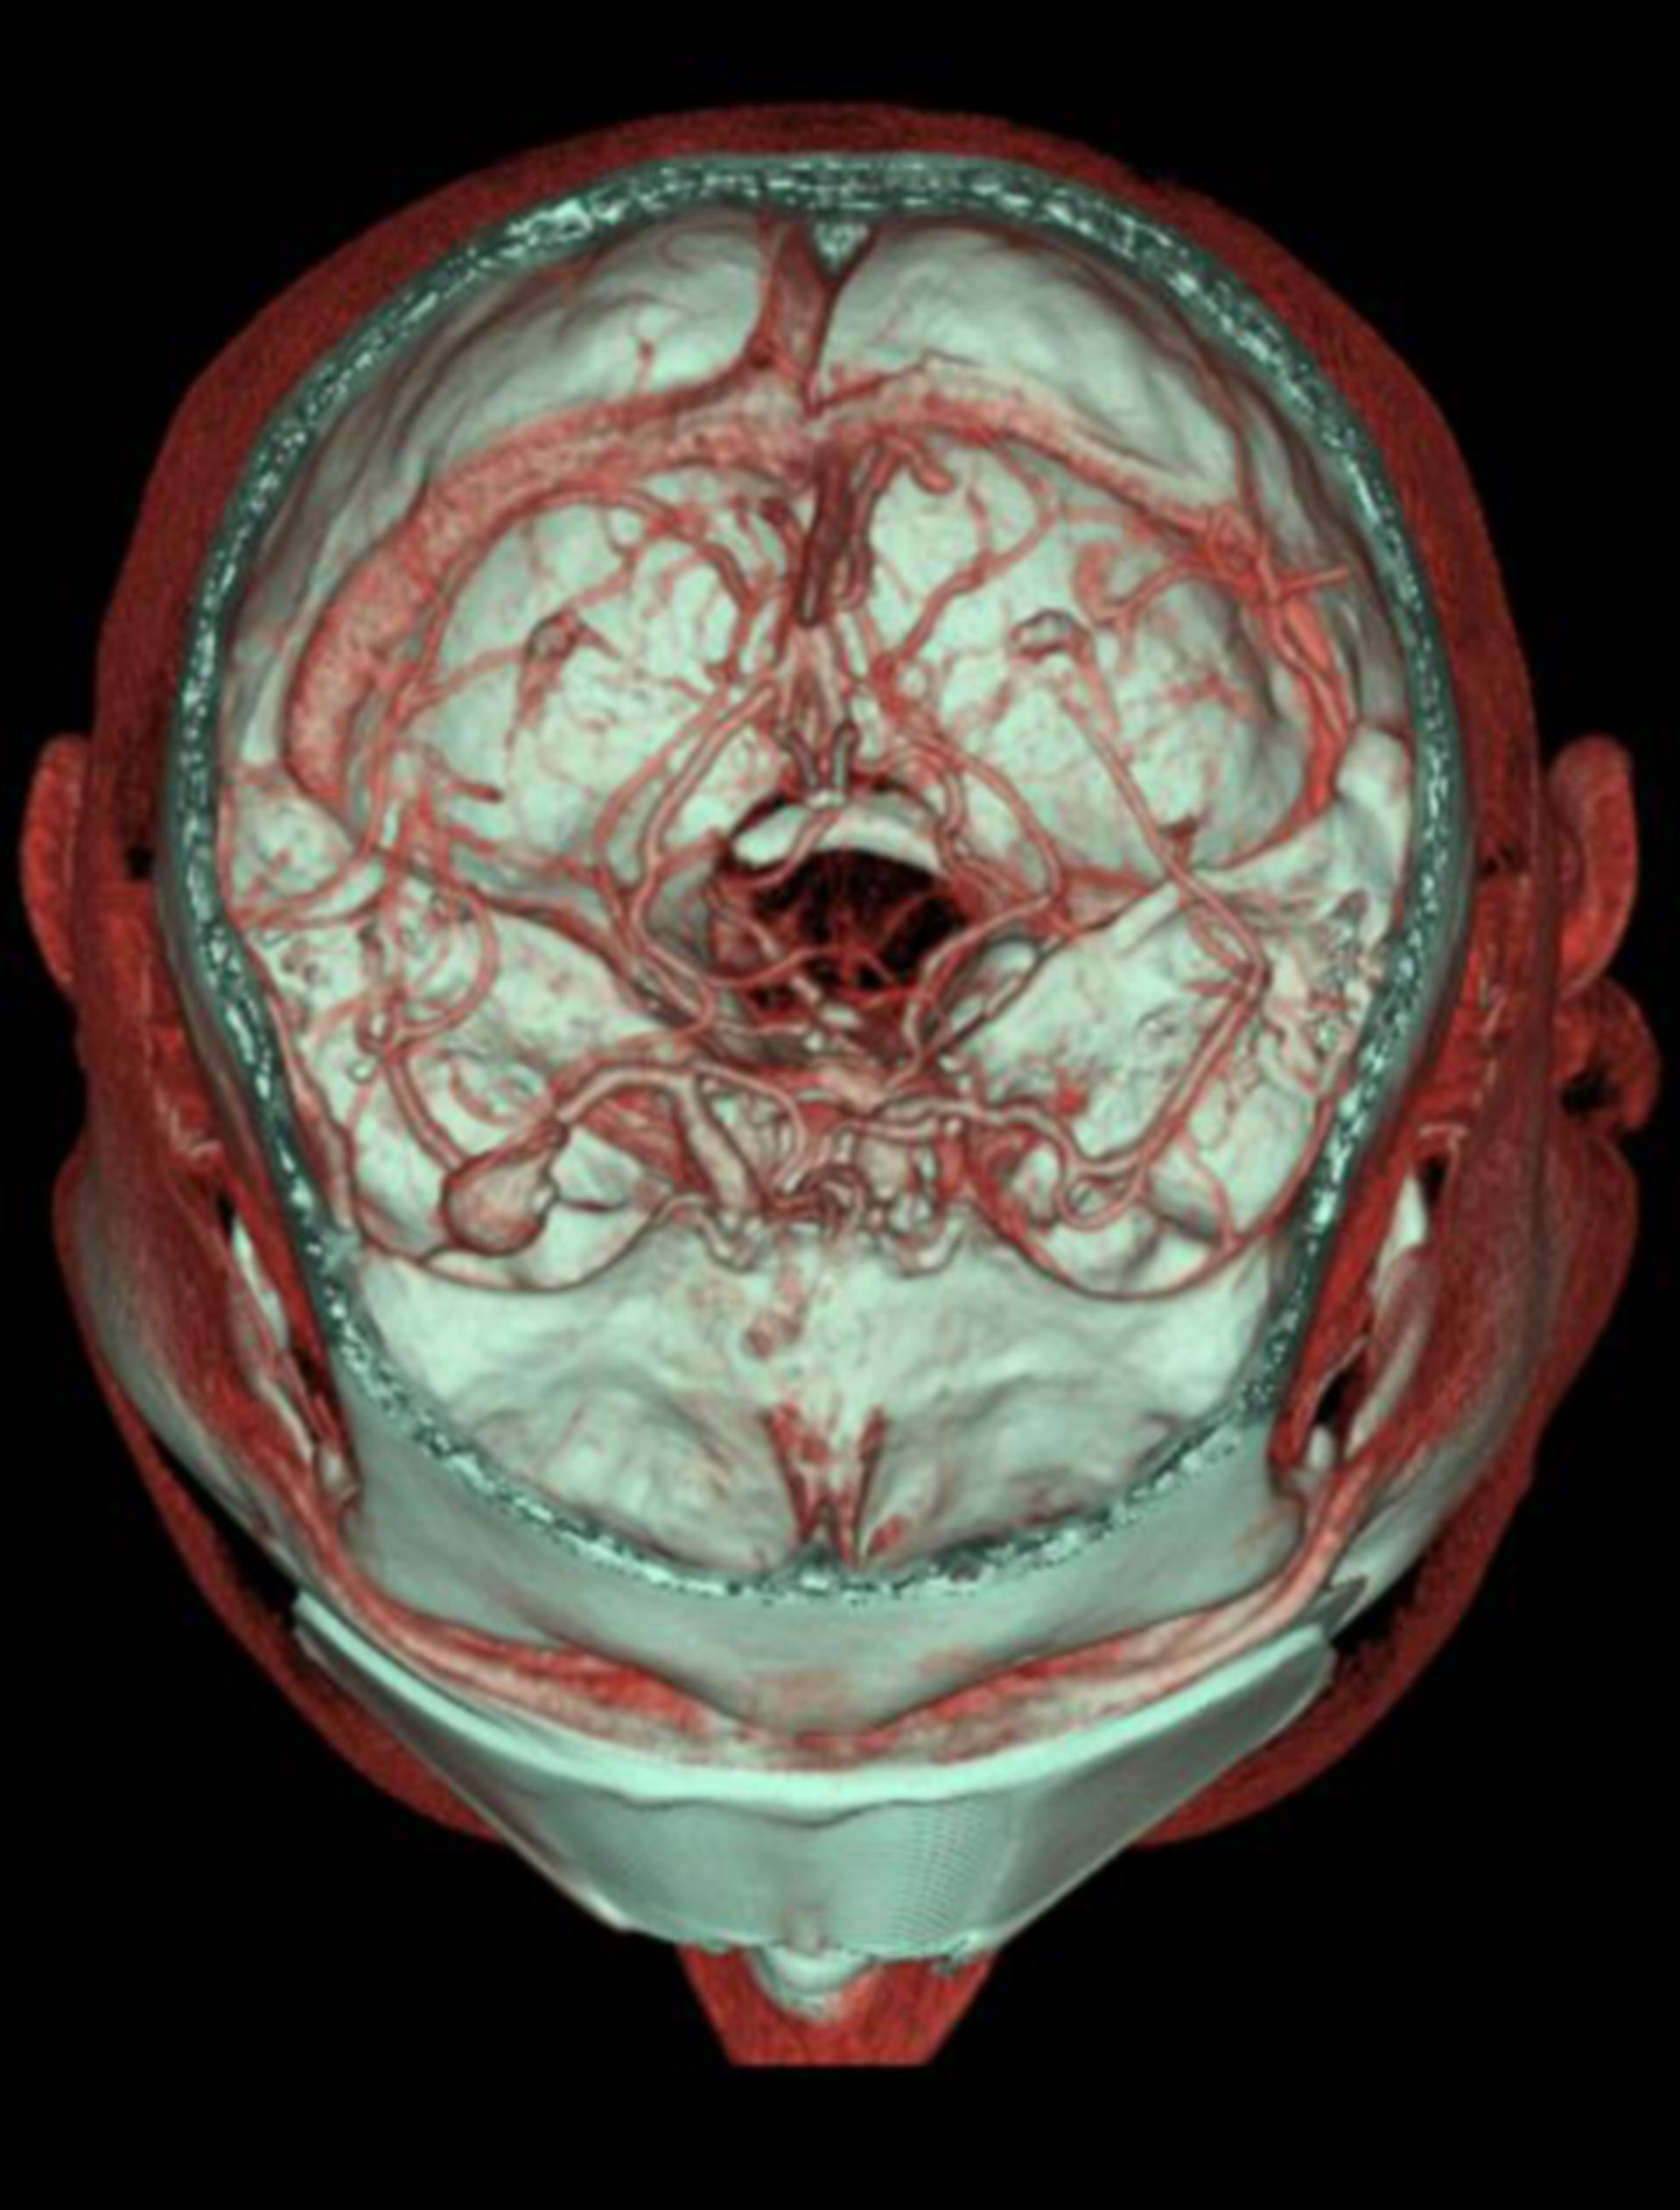 Aneurysma im Bereich der Trifurcation der Arteria cerebri media (CT-Angiographie)